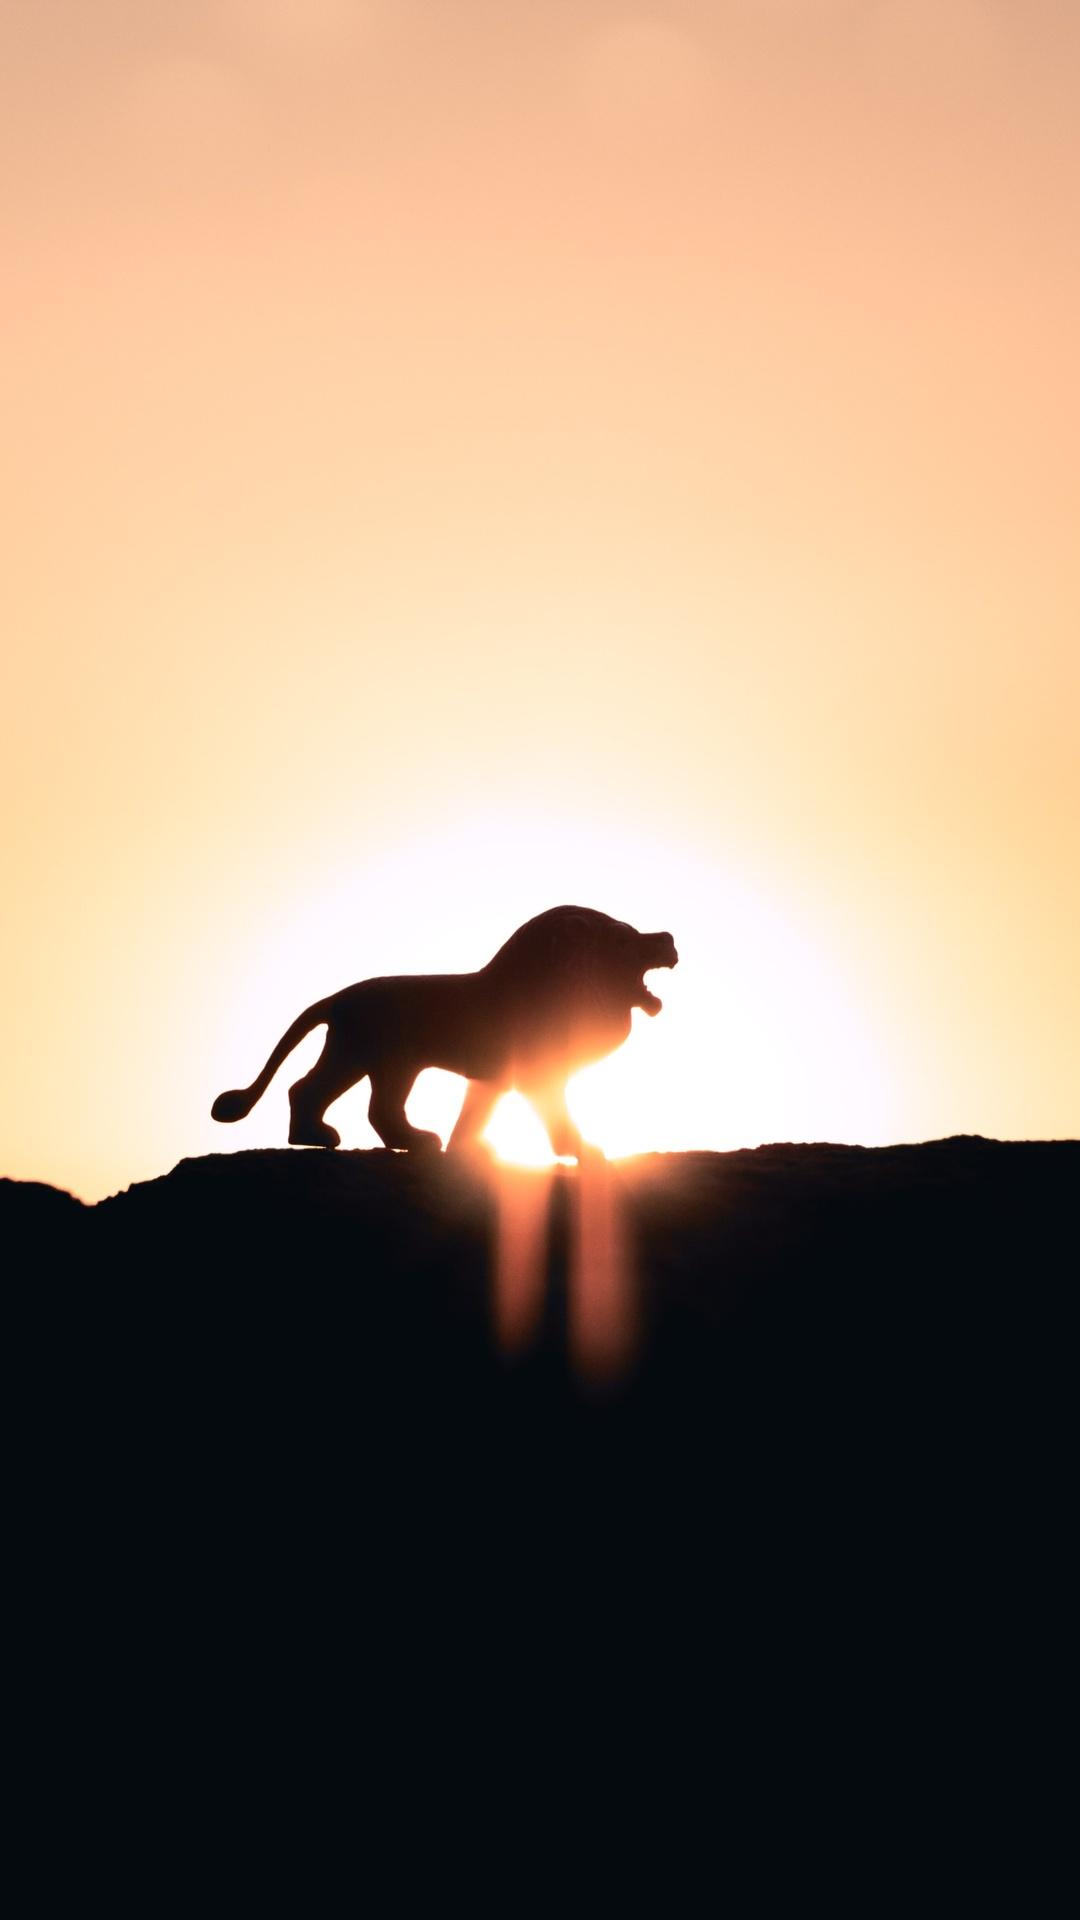 lion-roaring-on-top-of-mountain-5k-k7.jpg